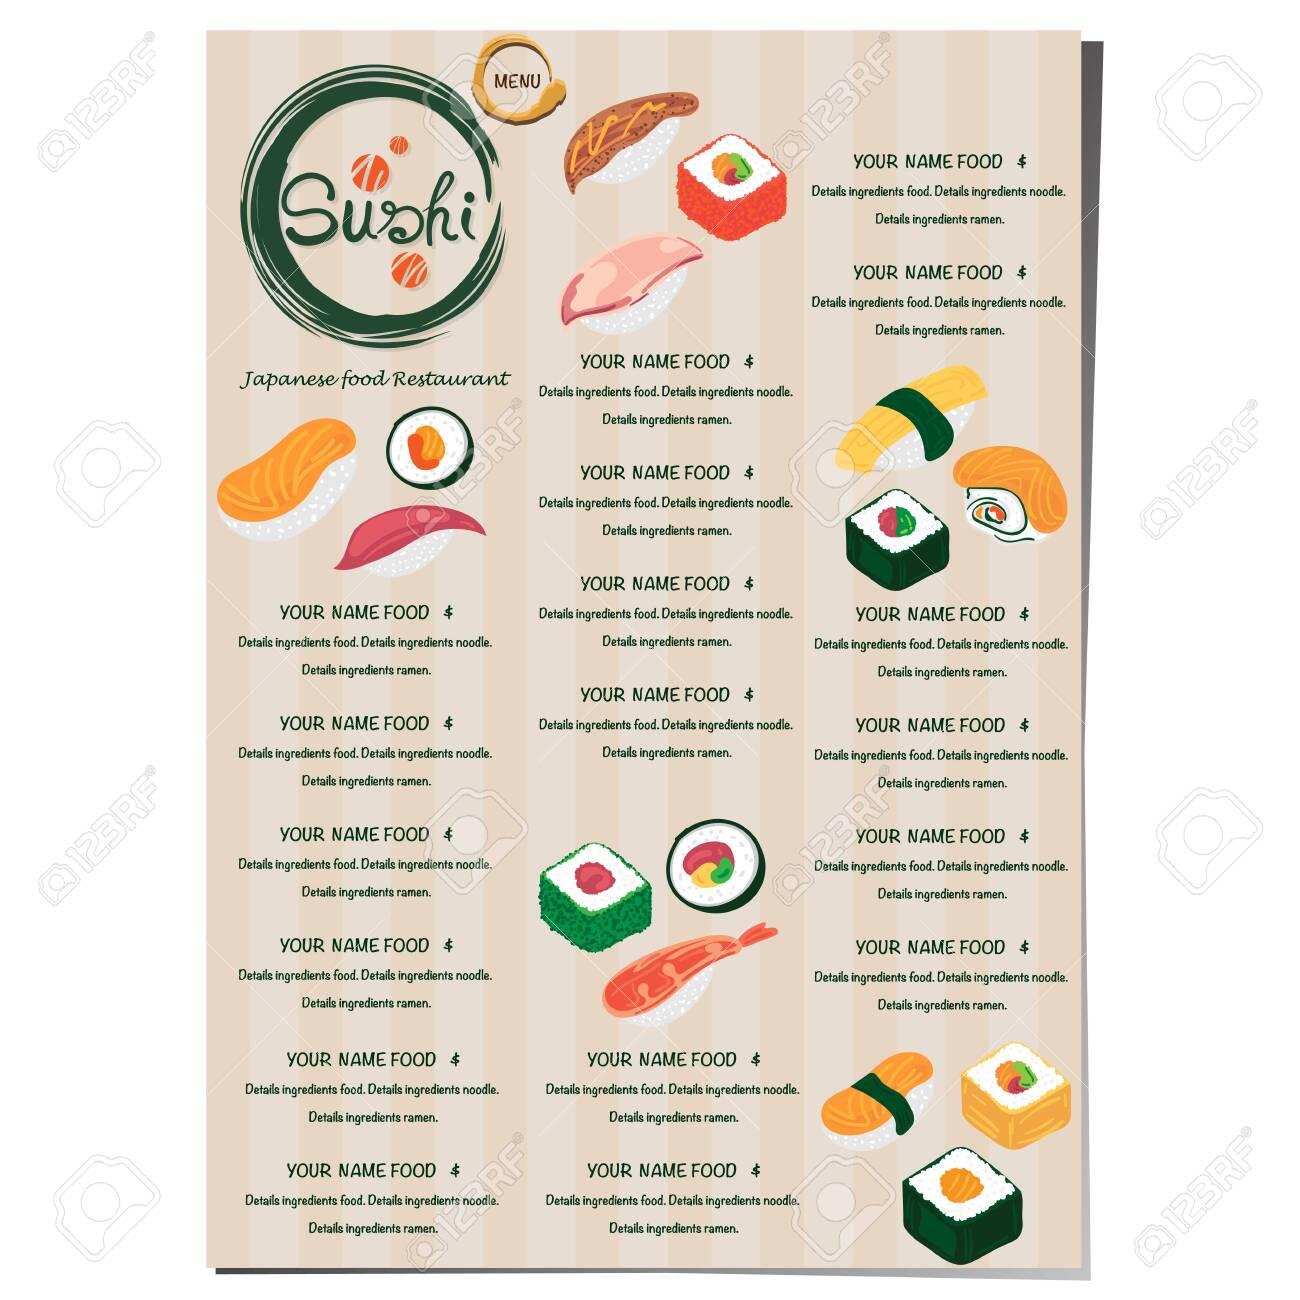 sushi japanese restaurant menu template design graphic - 131646432